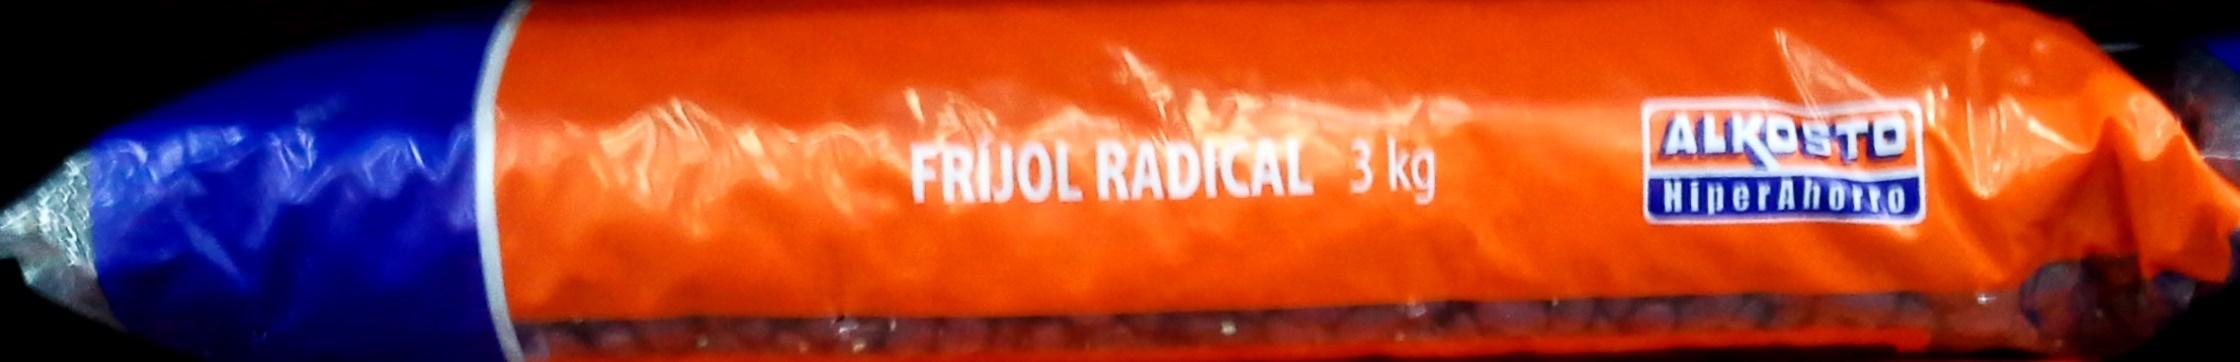 Frijol Alkosto Radical 3k